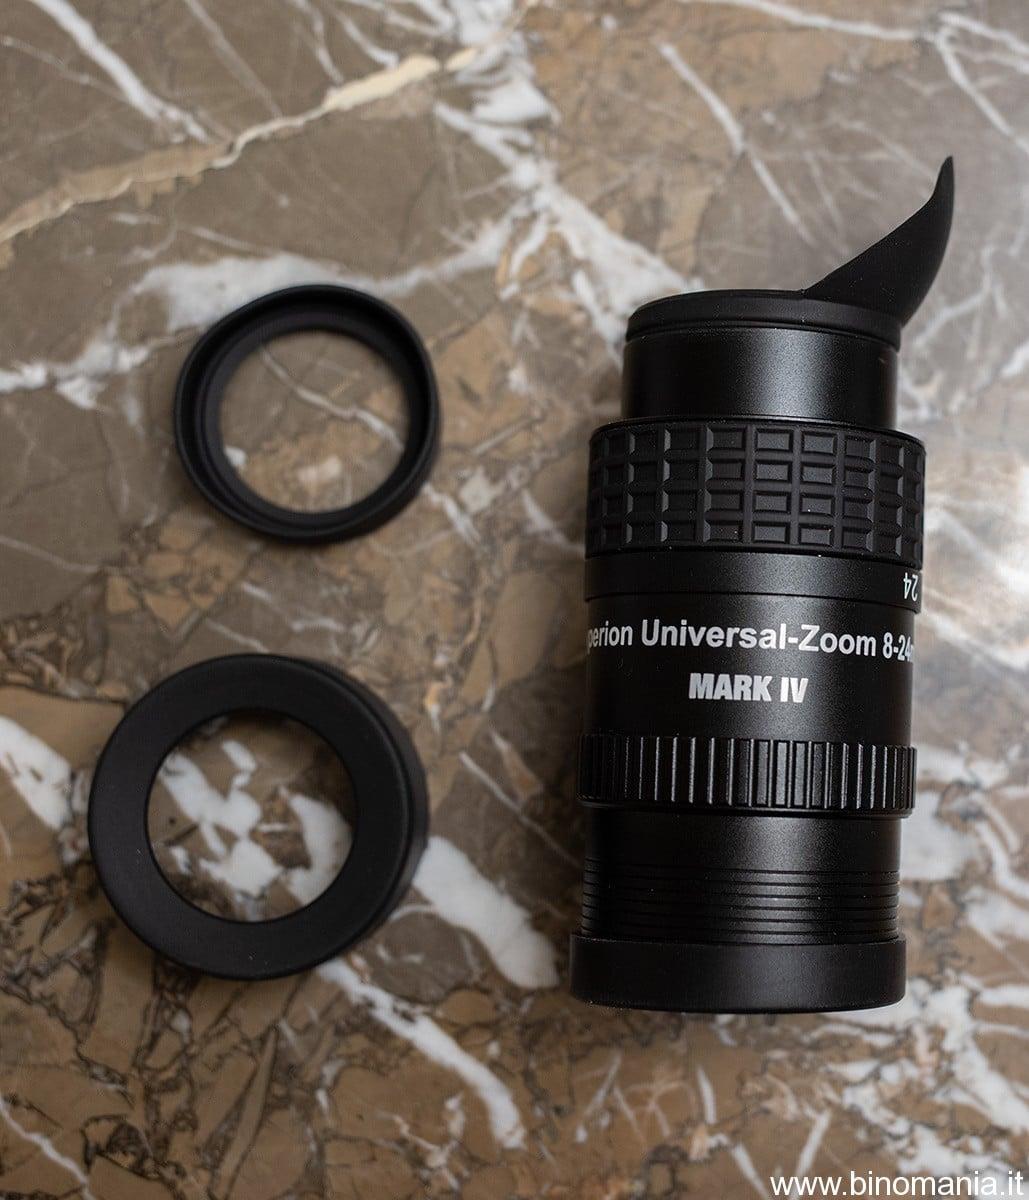 Baader in gomma Eyeshield IV per 40.5-41.5mm di diametro gli oculari 2402030A UK